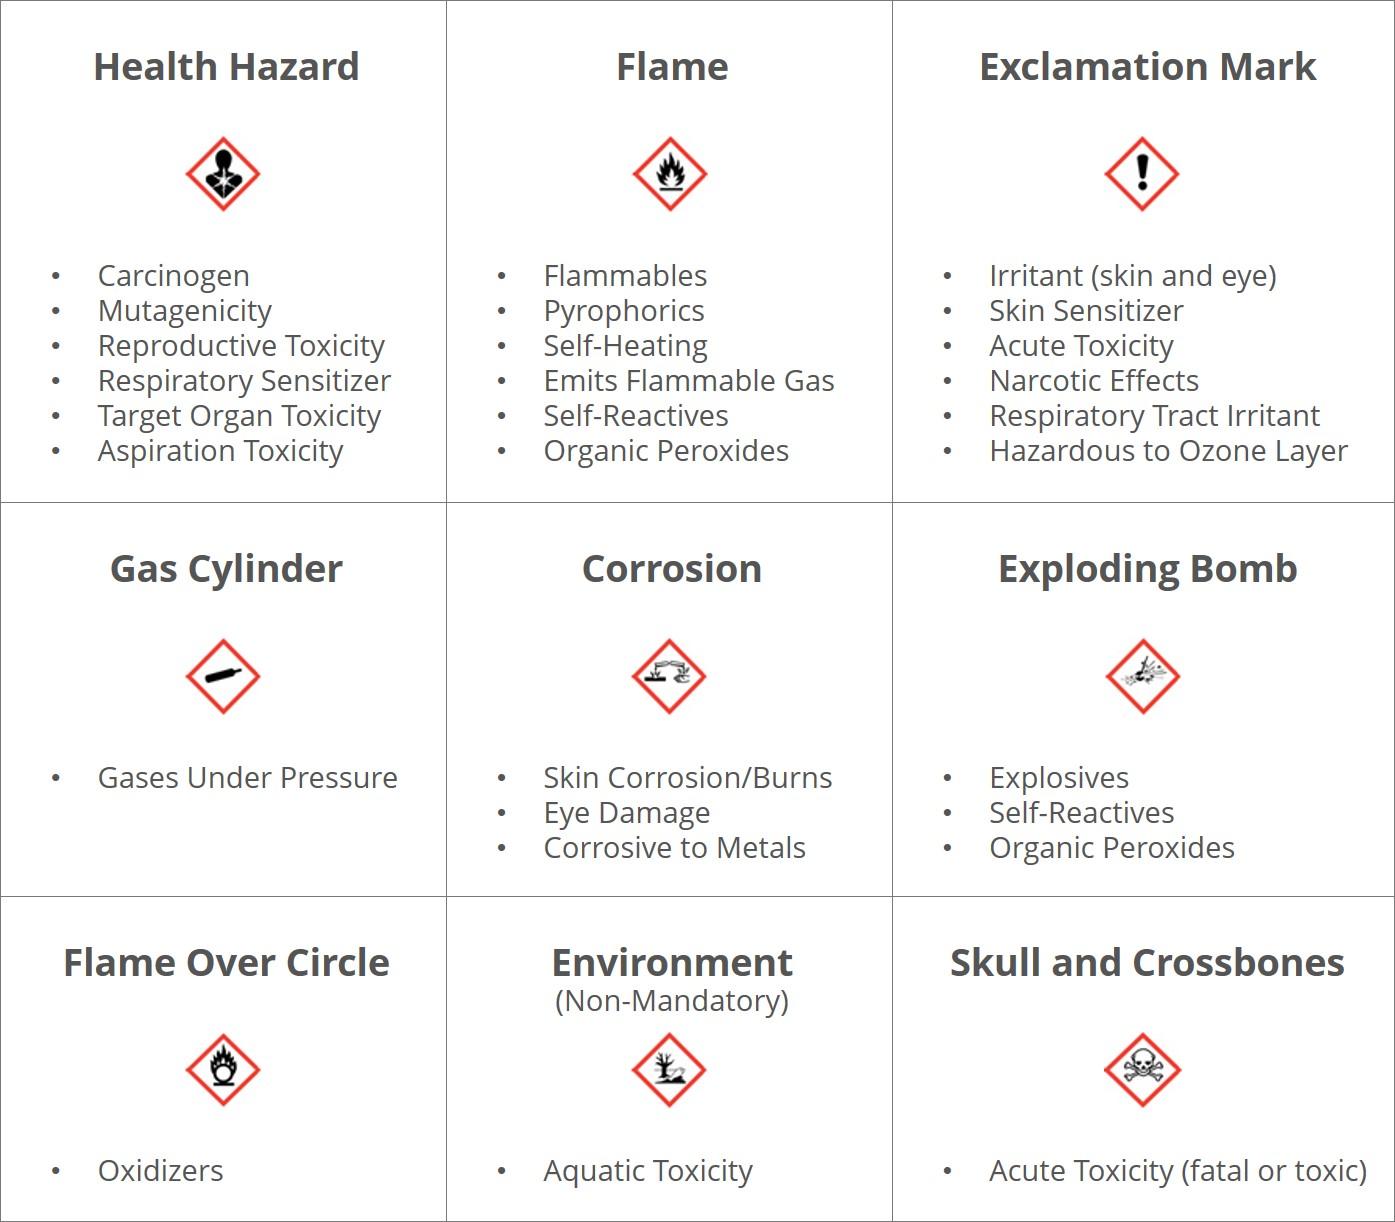 Hazard Communication Standard Pictogram for GHS